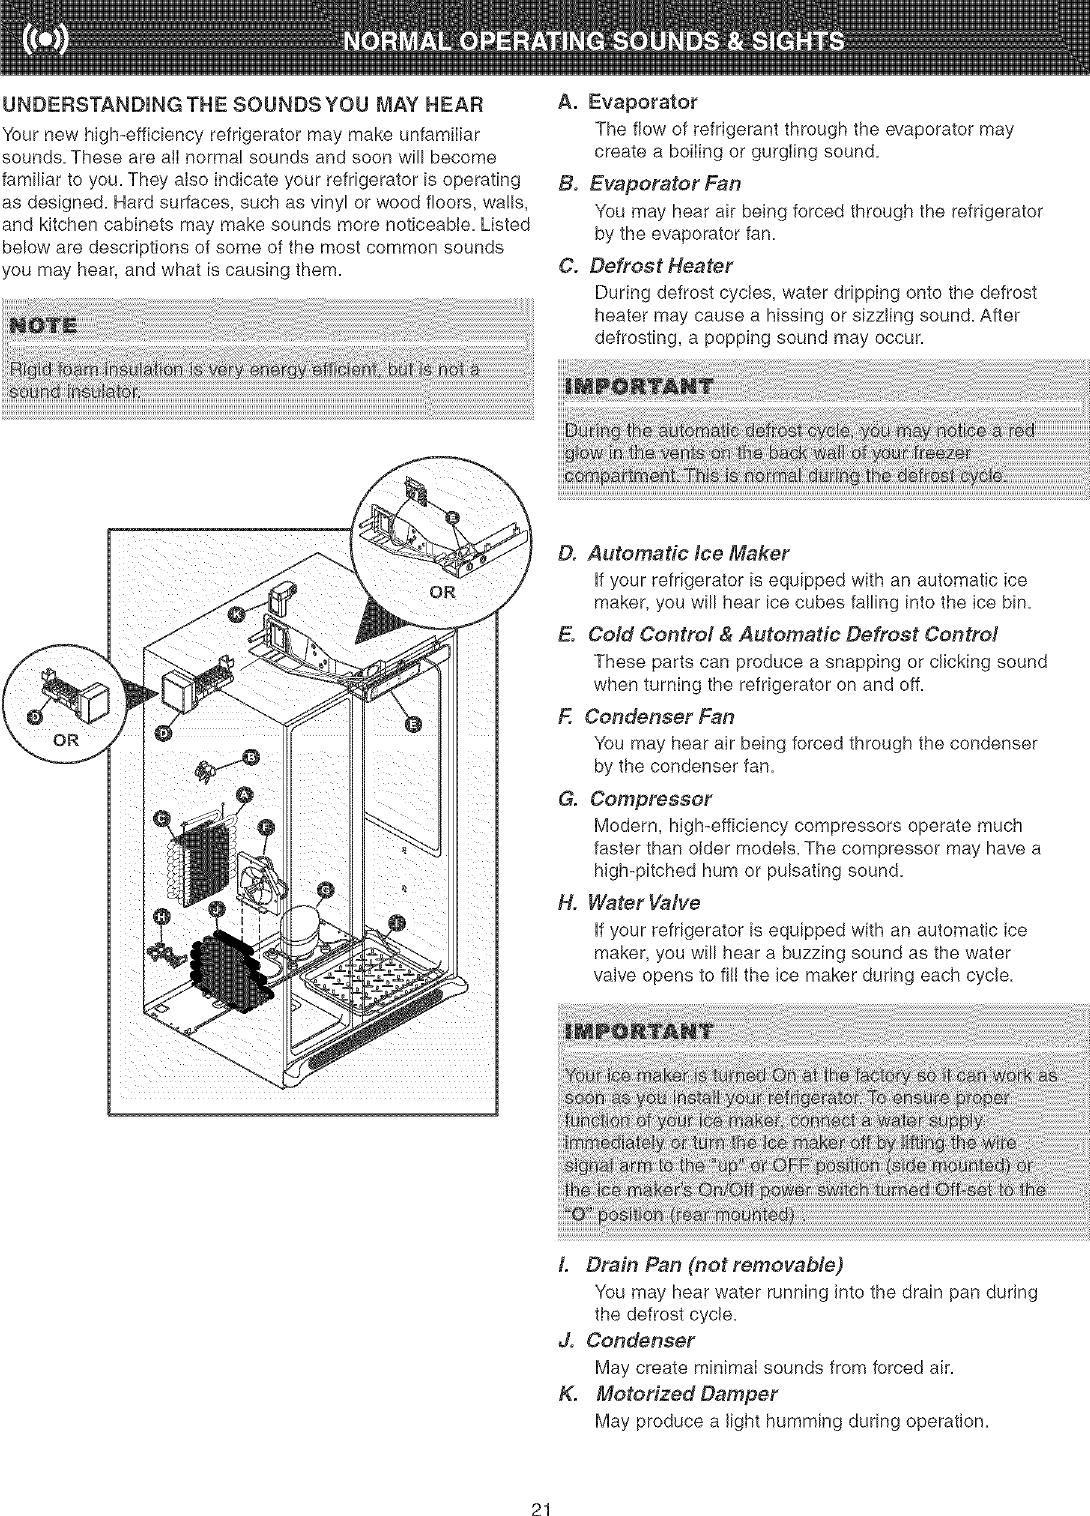 Frigidaire FSC23F7HB4 User Manual REFRIGERATOR Manuals And